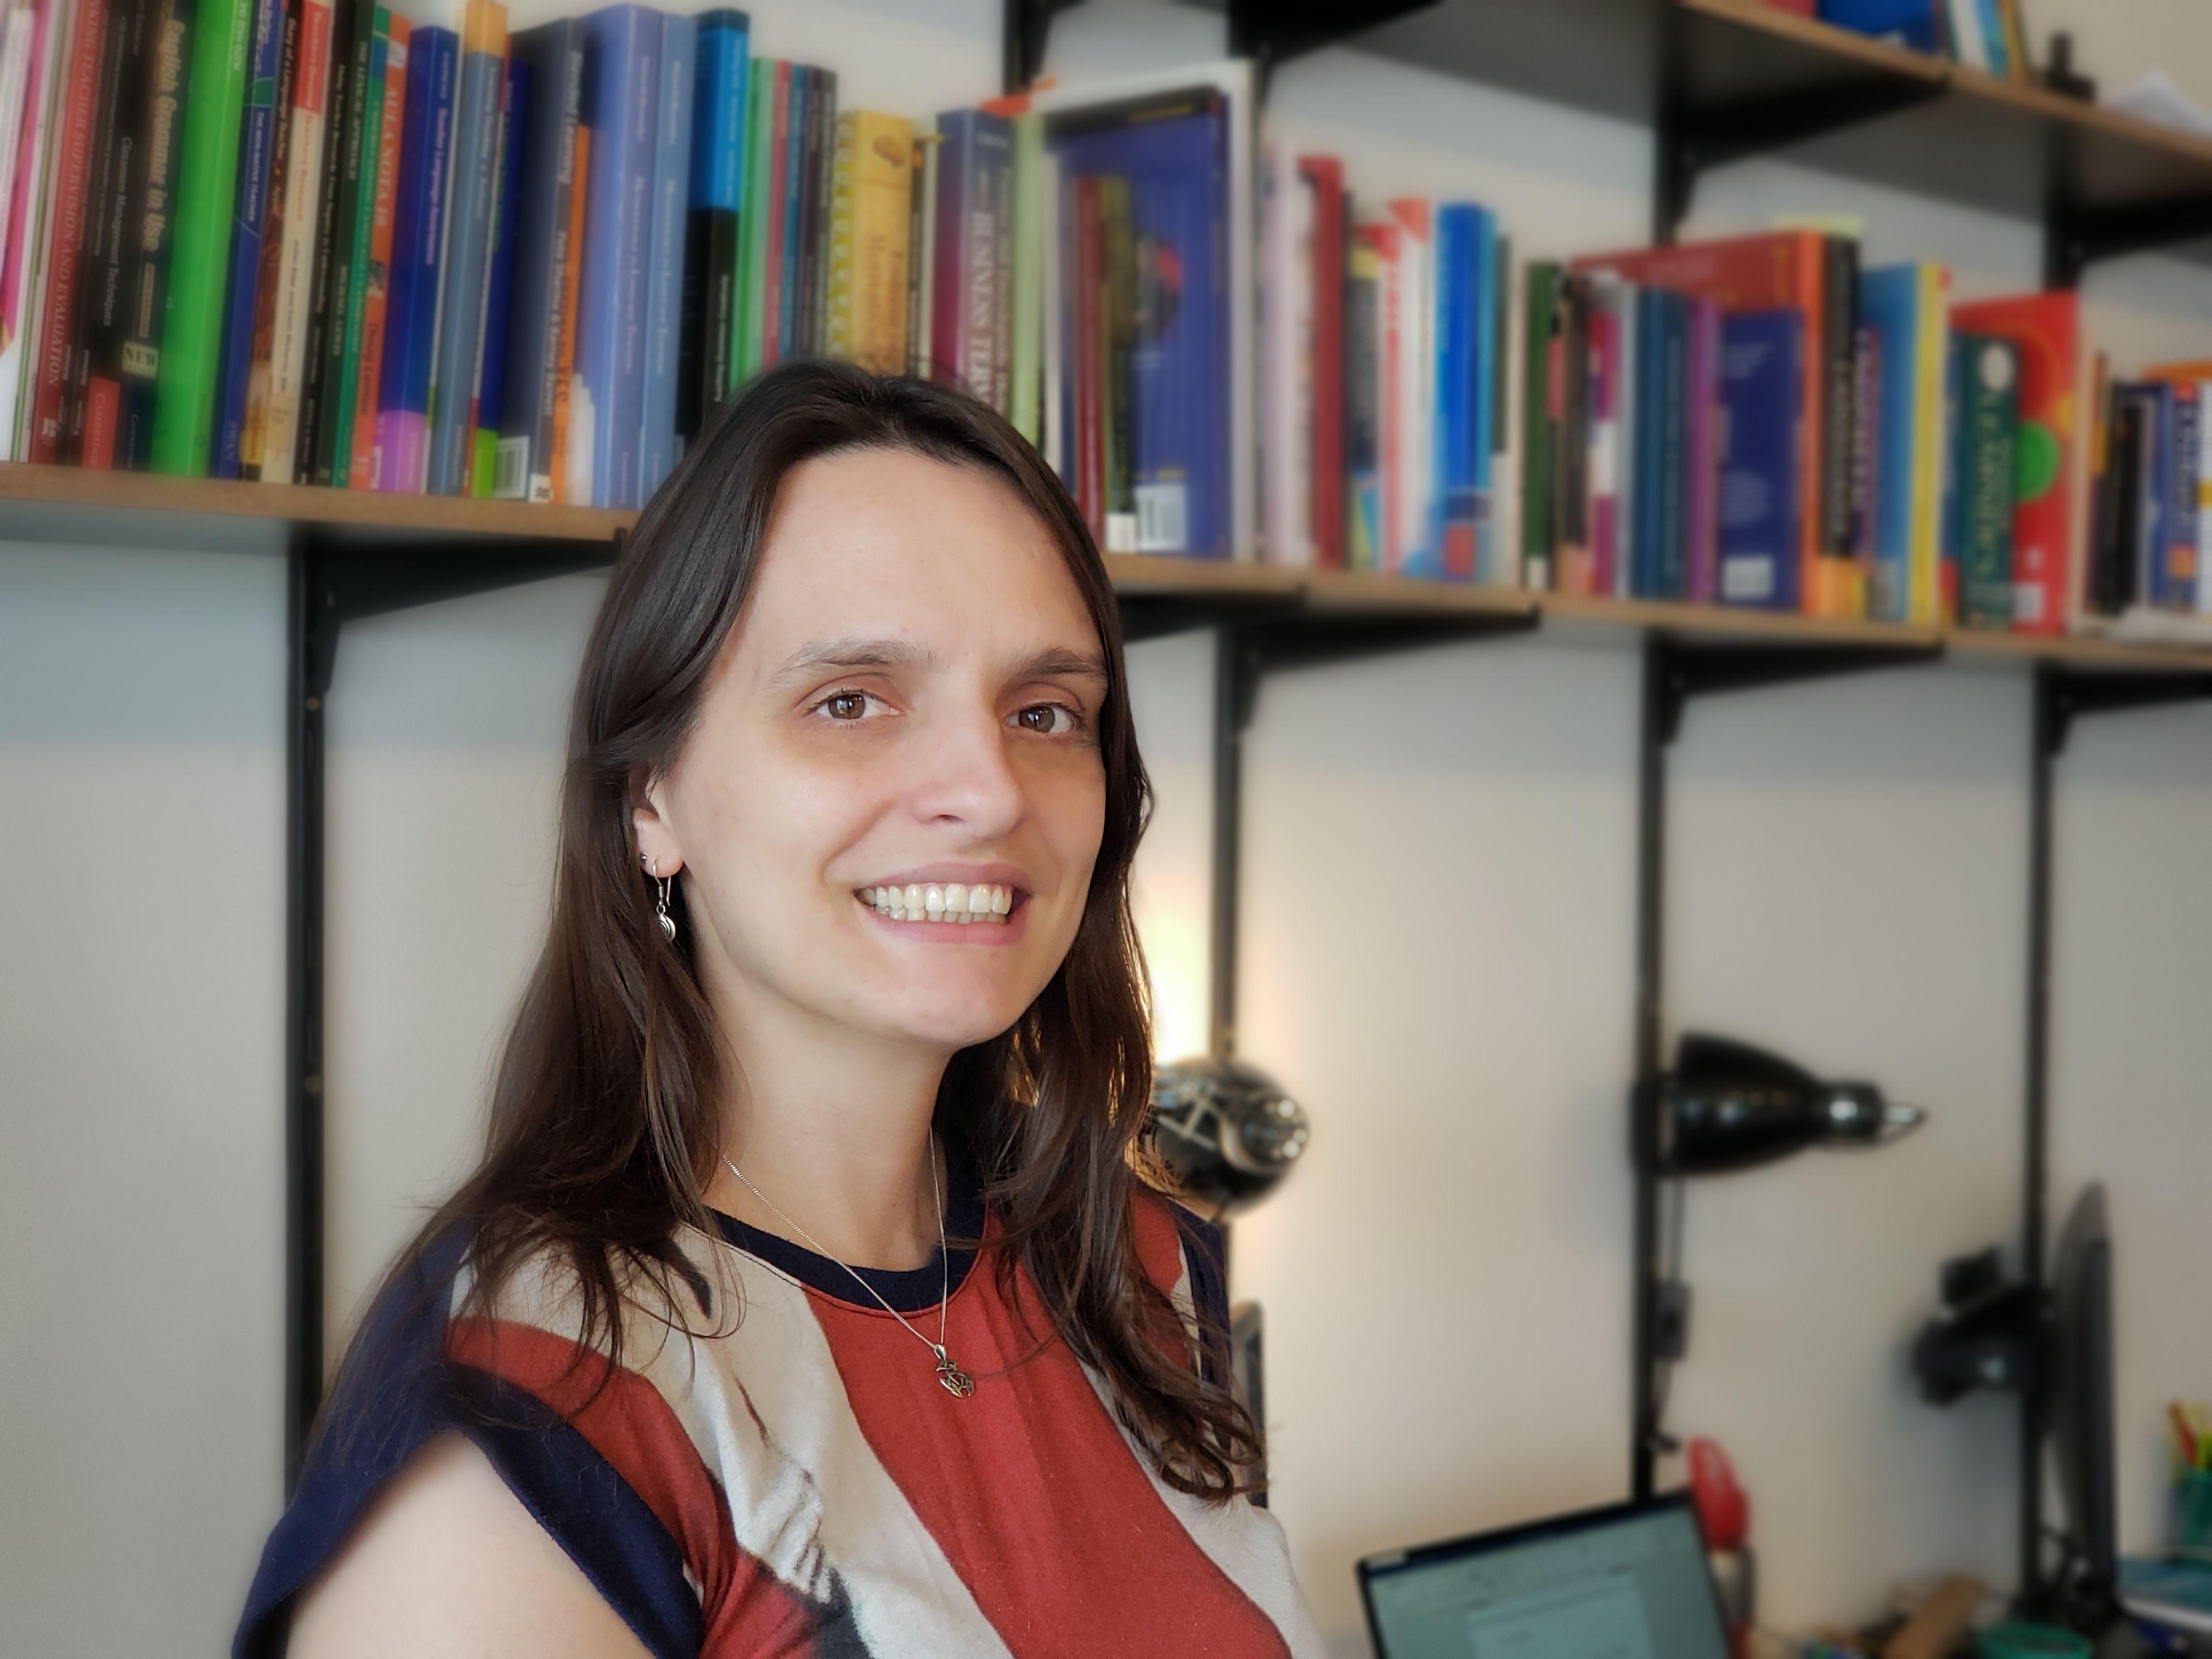 Leticia Moraes